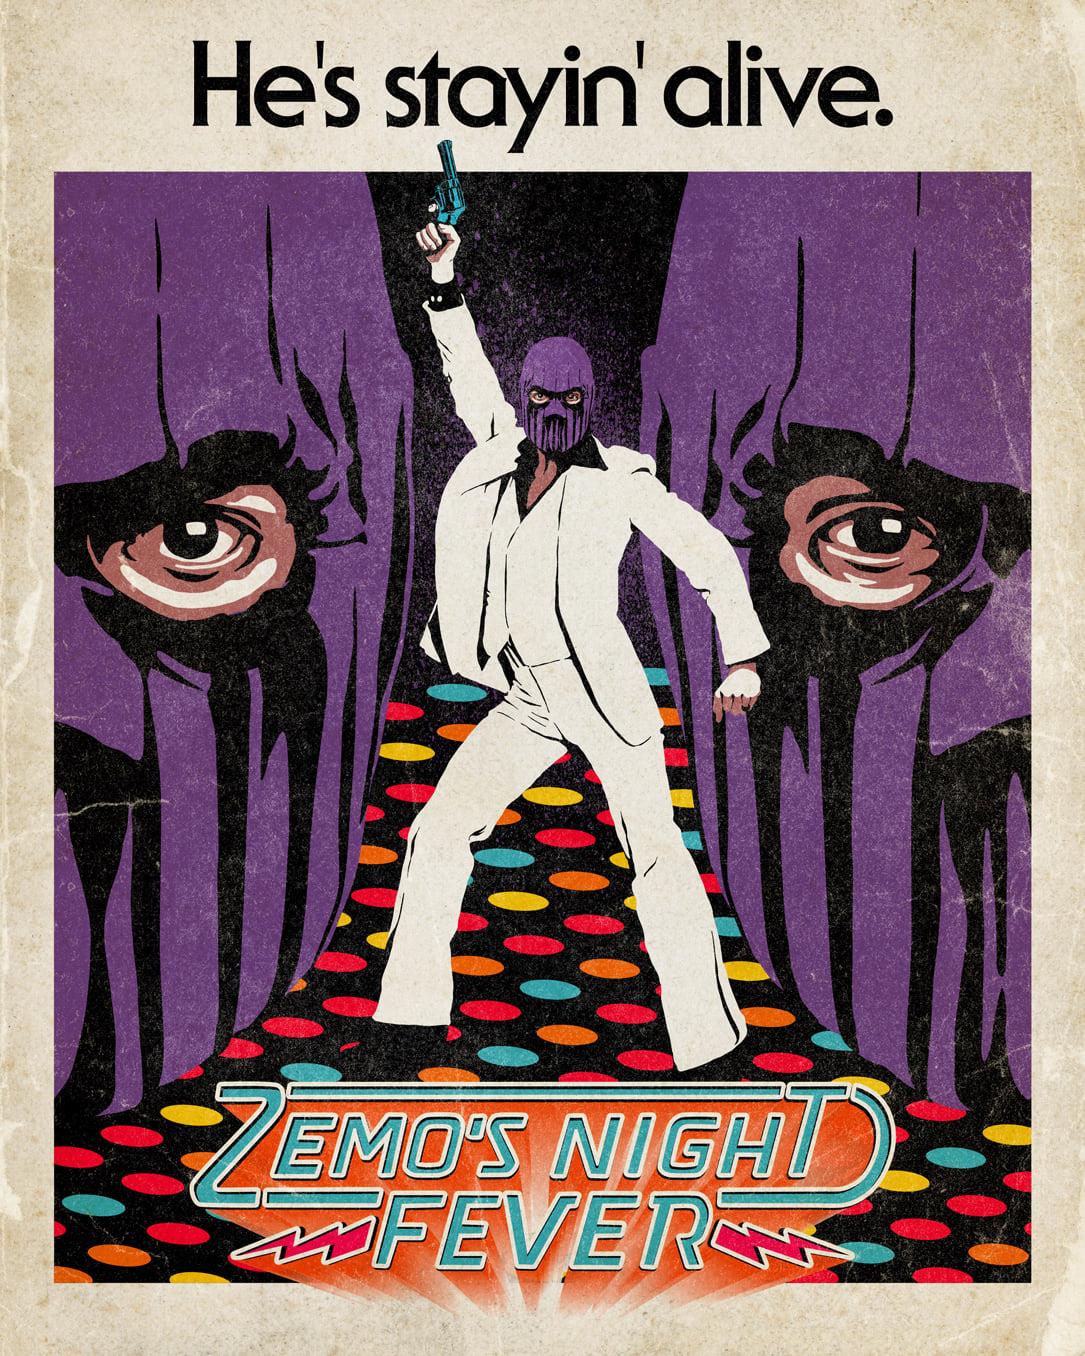 baron bucky captain america comics Jimi Hendrix marvel Pop Art Sam Wilson studios Zemo